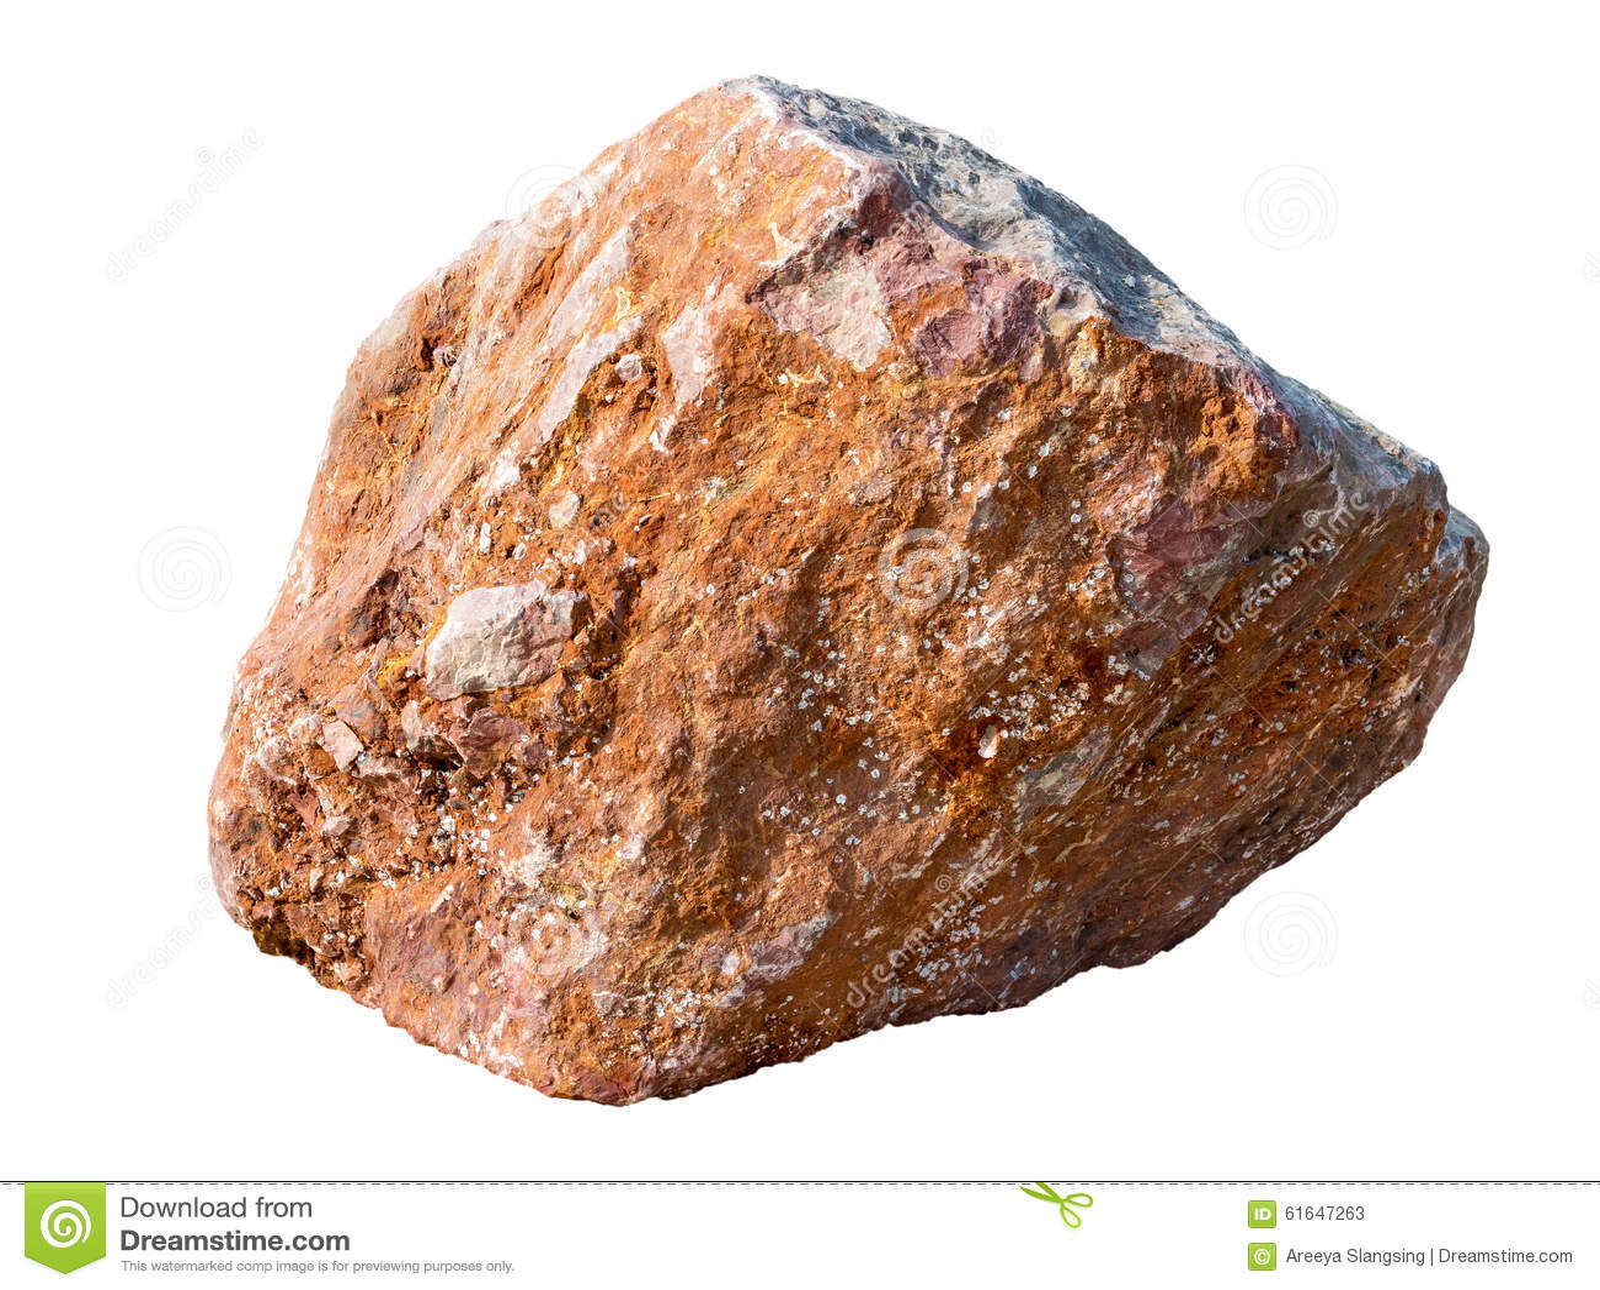 White Granite Rock : Big granite rock stone isolated on white stock photo